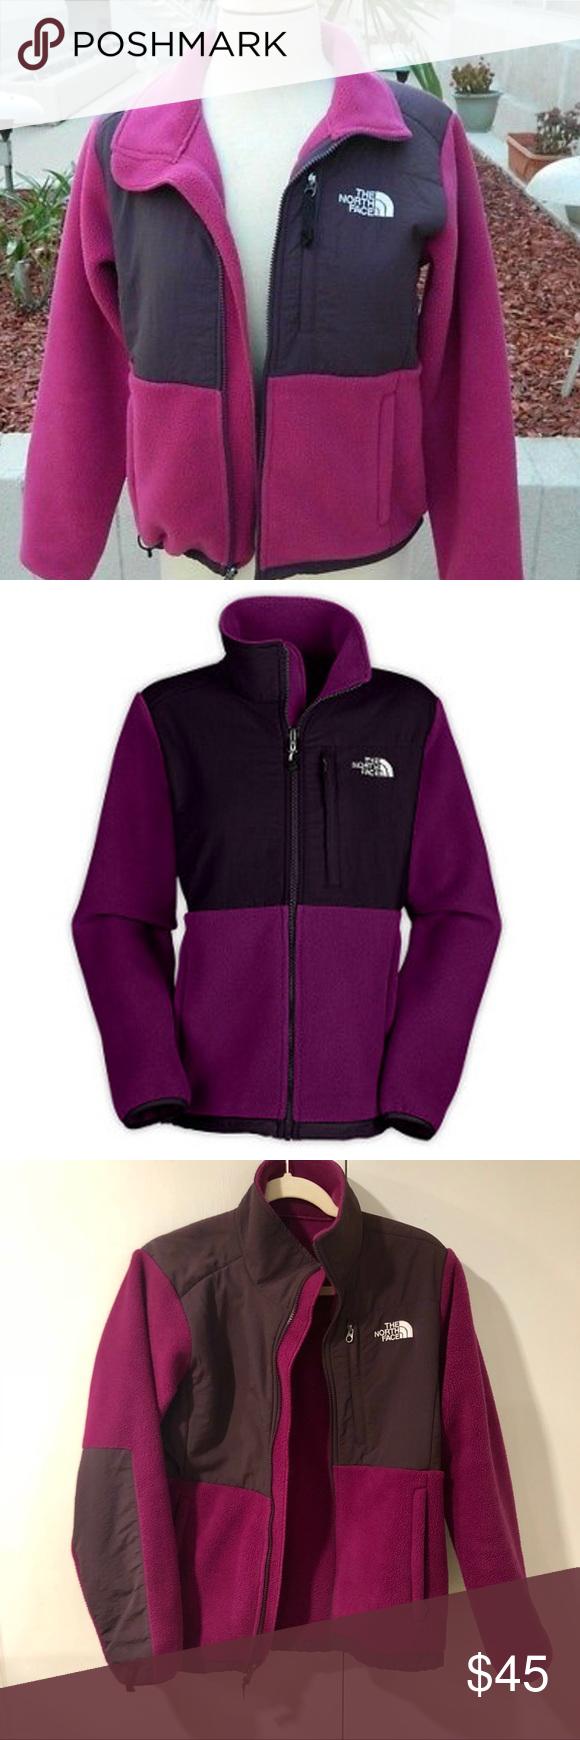 North face denali fleece jacketupurple size medium my posh picks